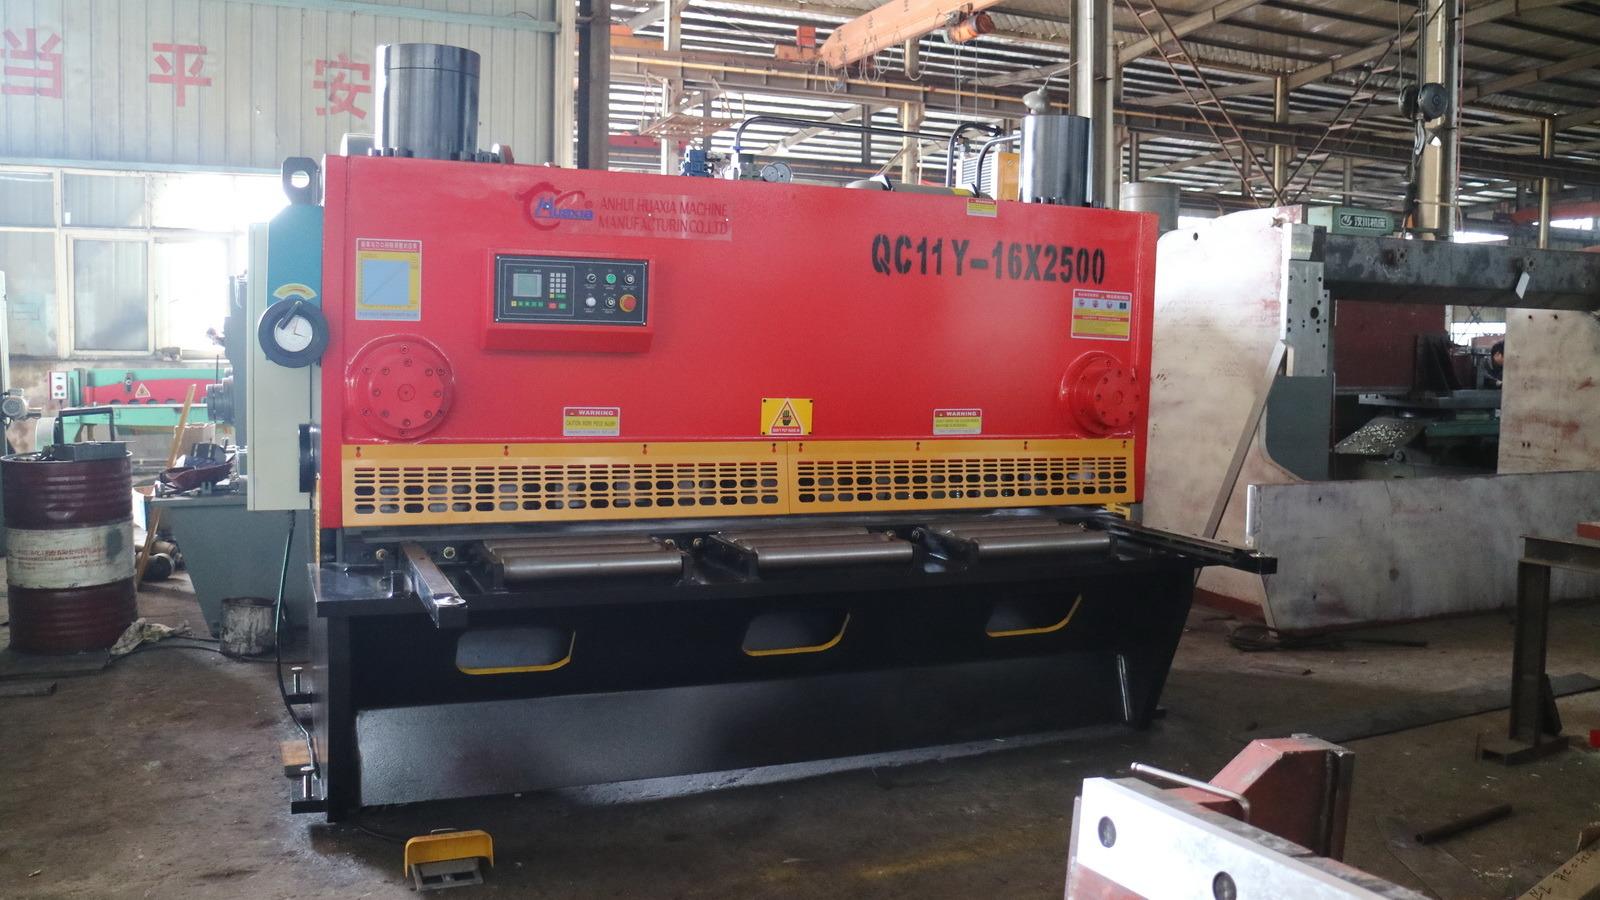 Hydraulic Guillotine Shearing Machine for Metal, Cutting Machine QC11k 16*2500